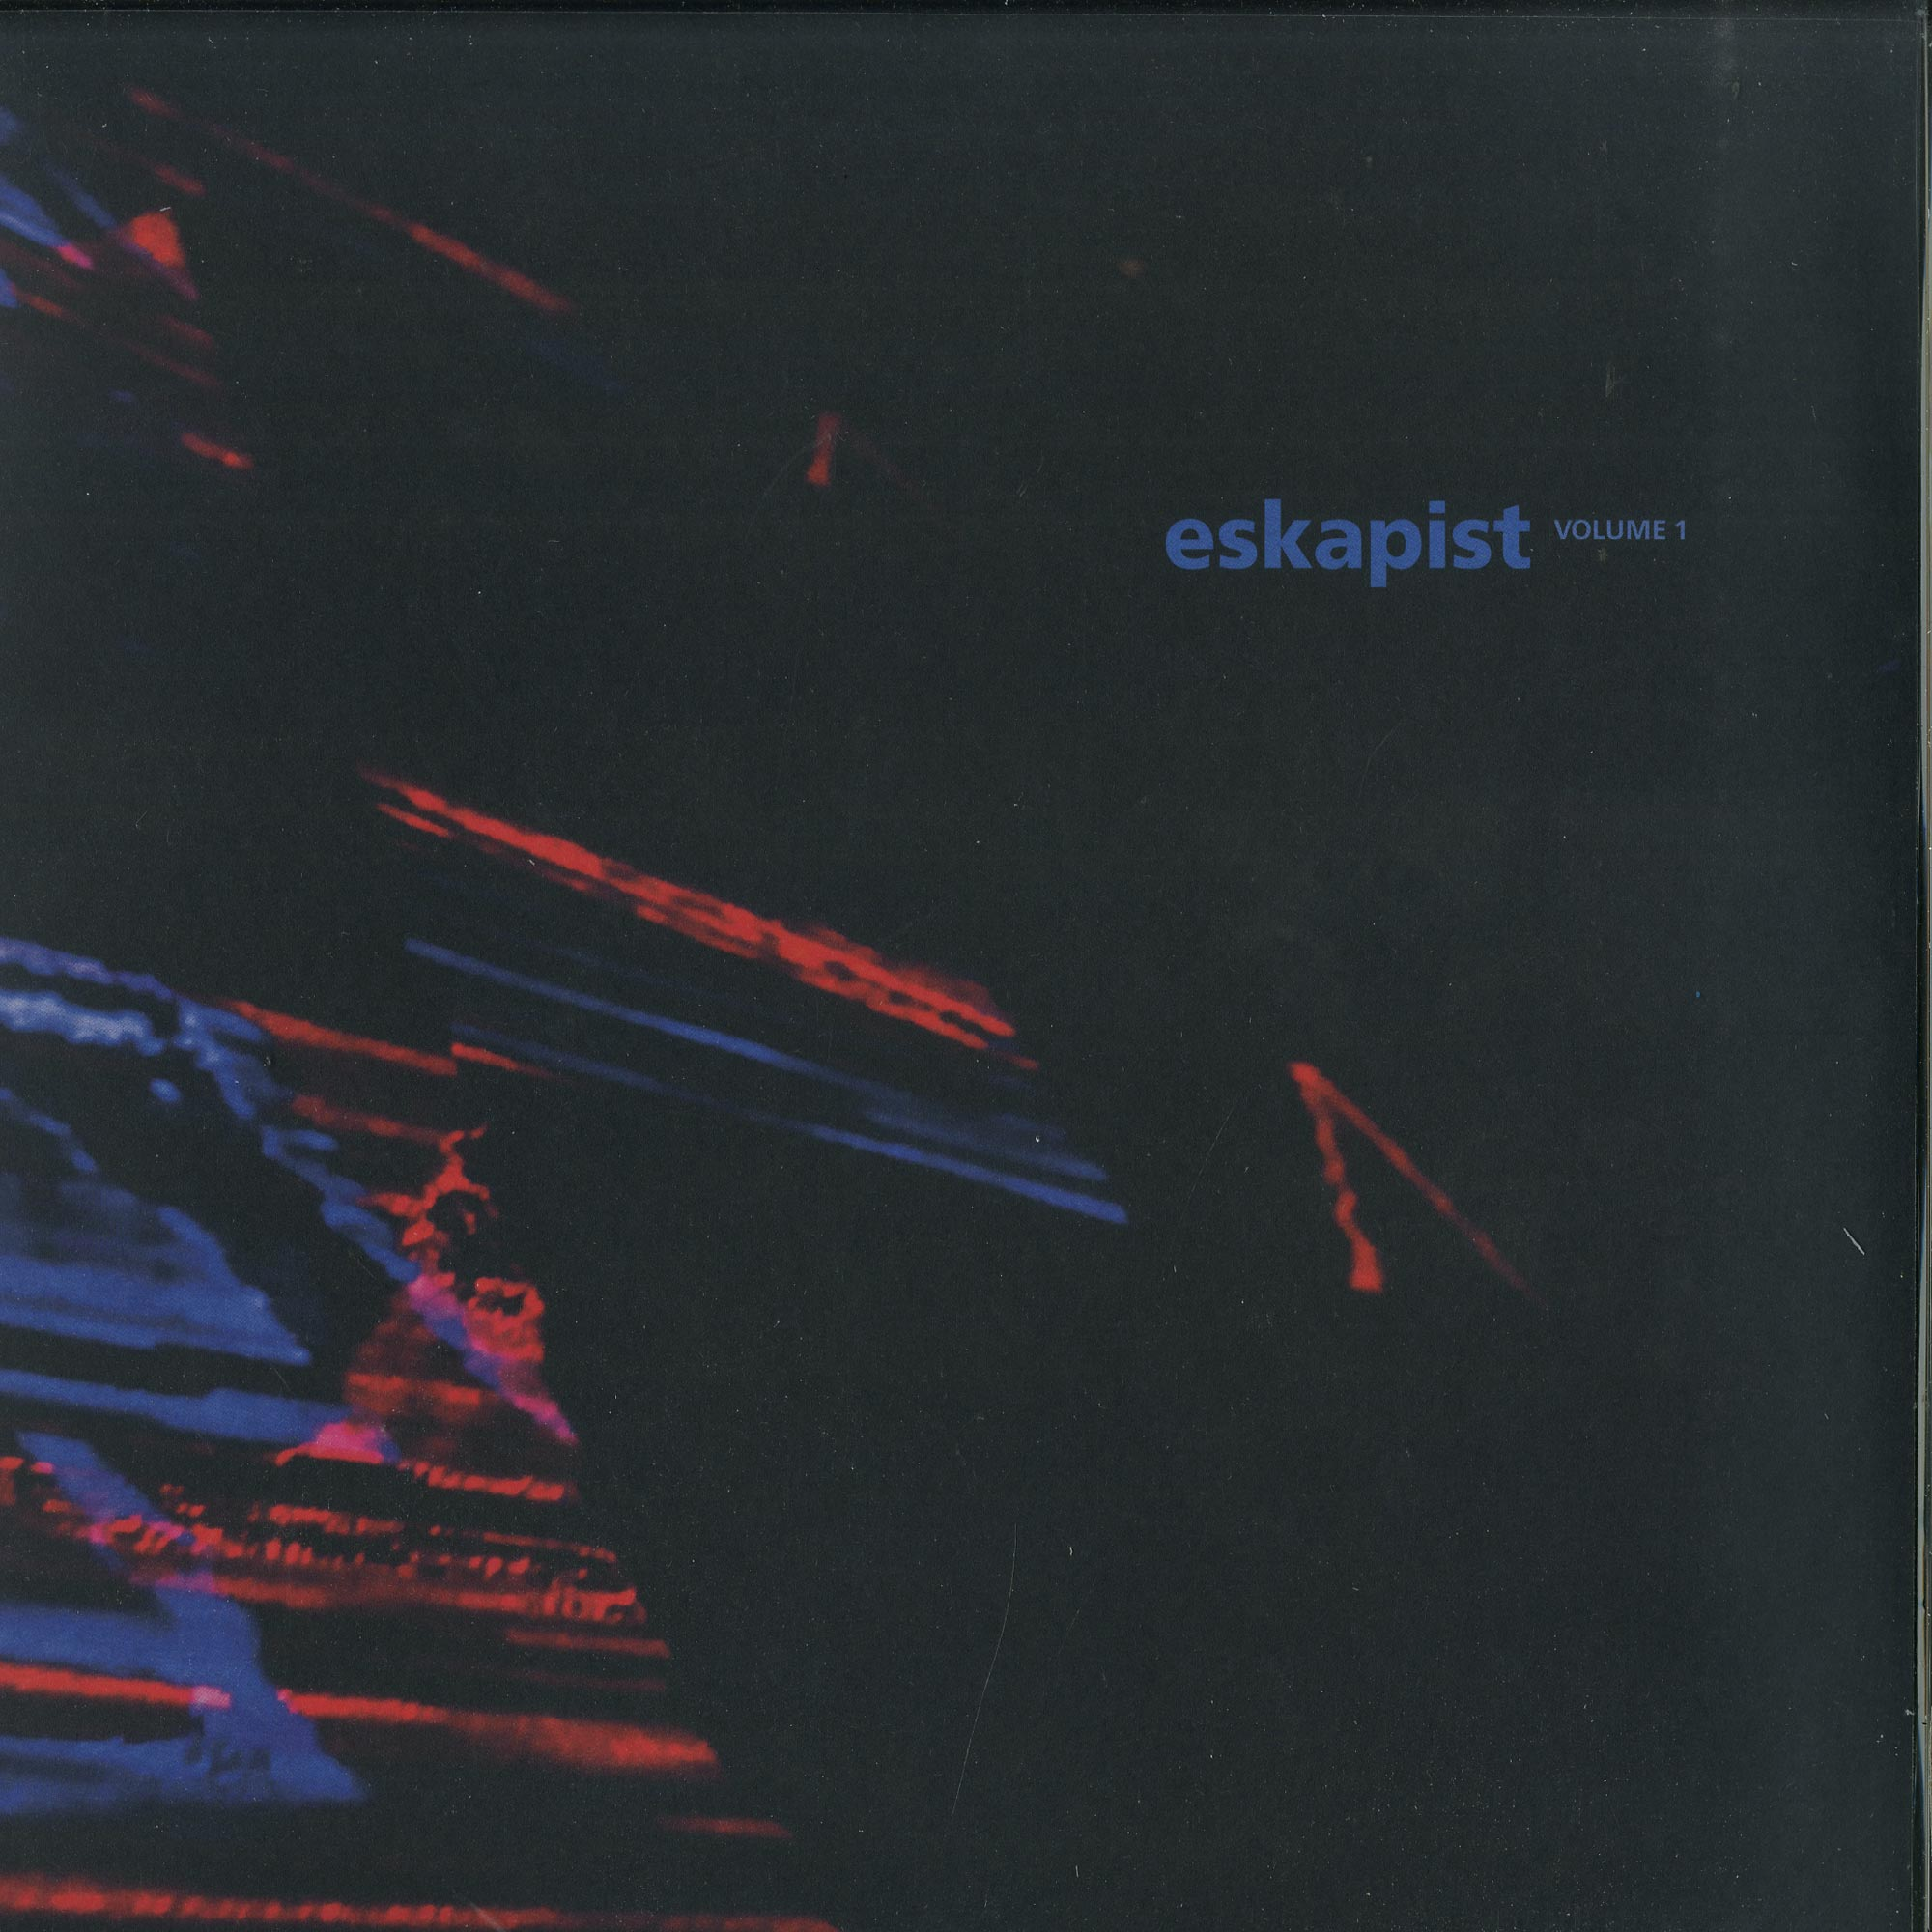 Eskapist - ESKAPIST VOLUME 1